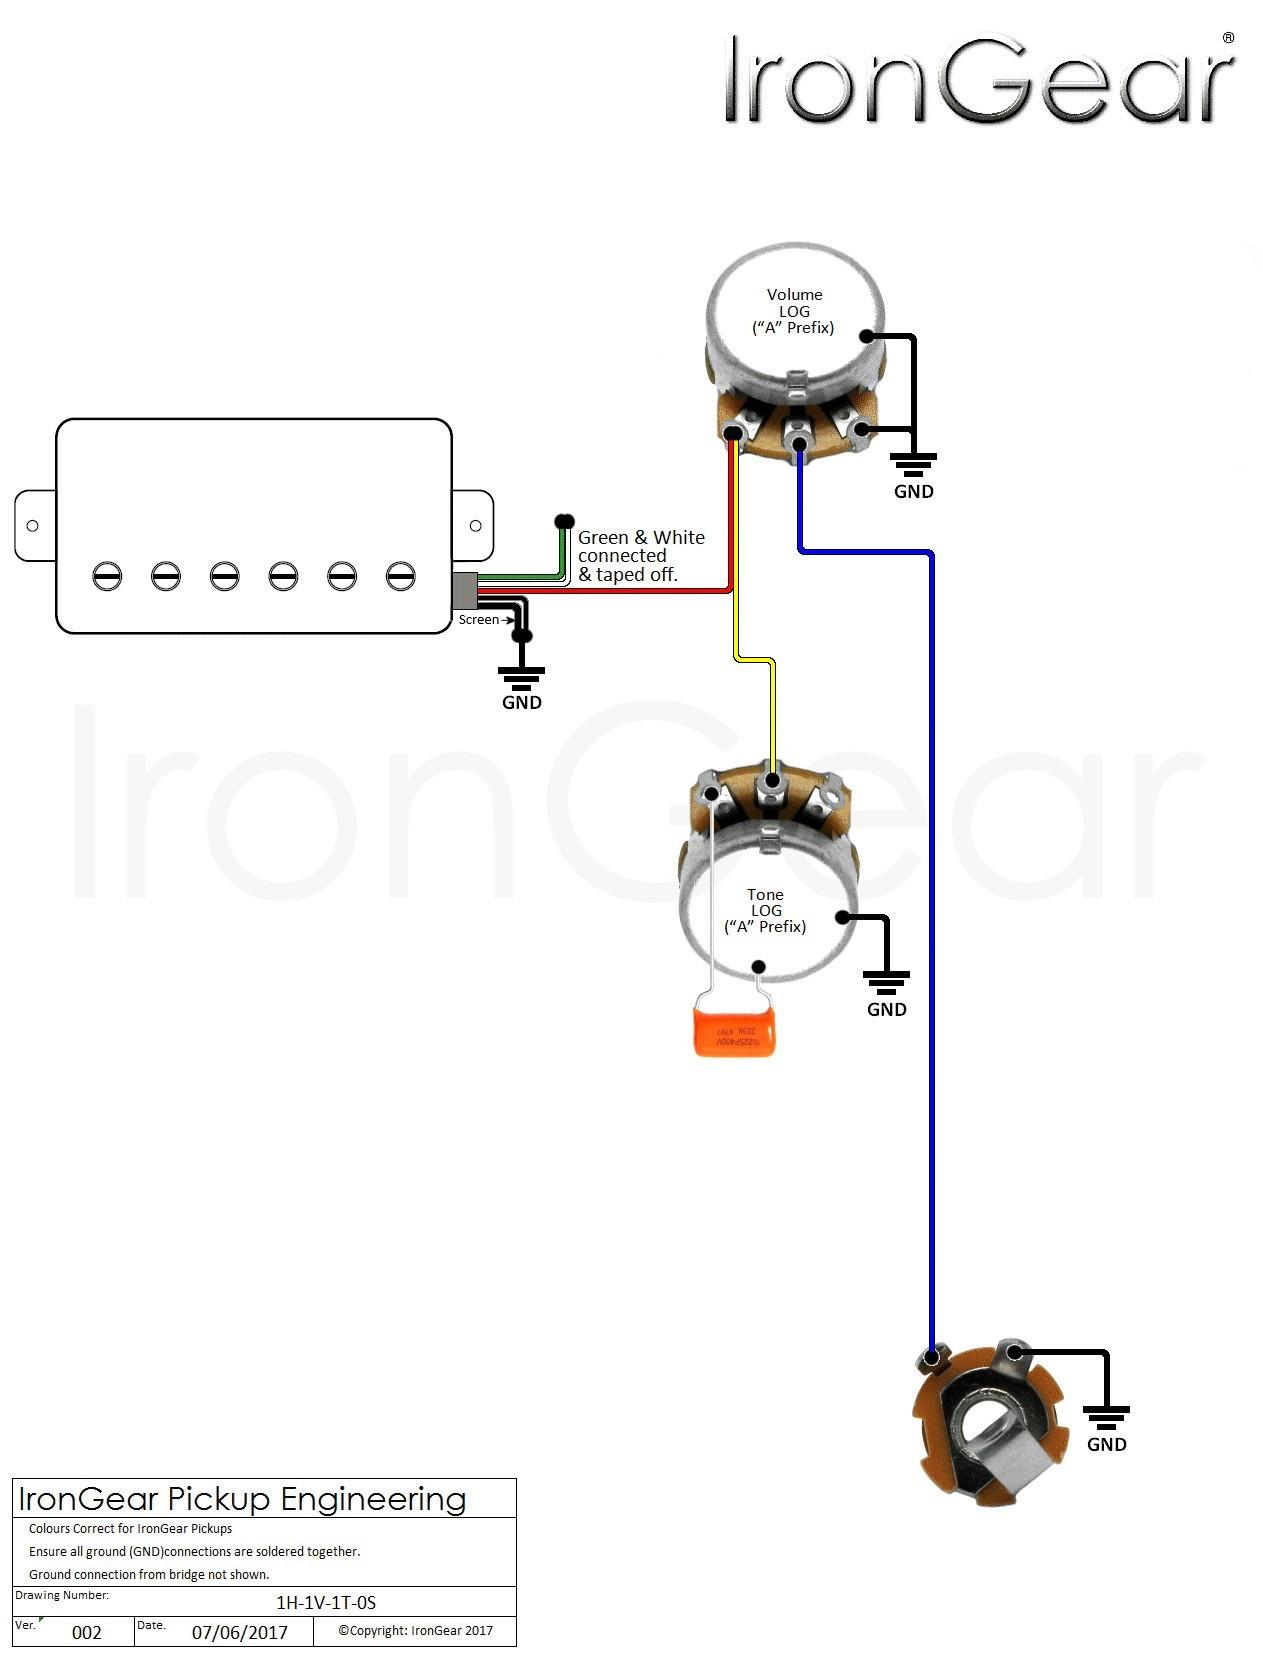 Guitar Wiring Diagram e Humbucker Inspirationa Wiring Diagram for E Pickup Guitar Inspirationa Electric Guitar